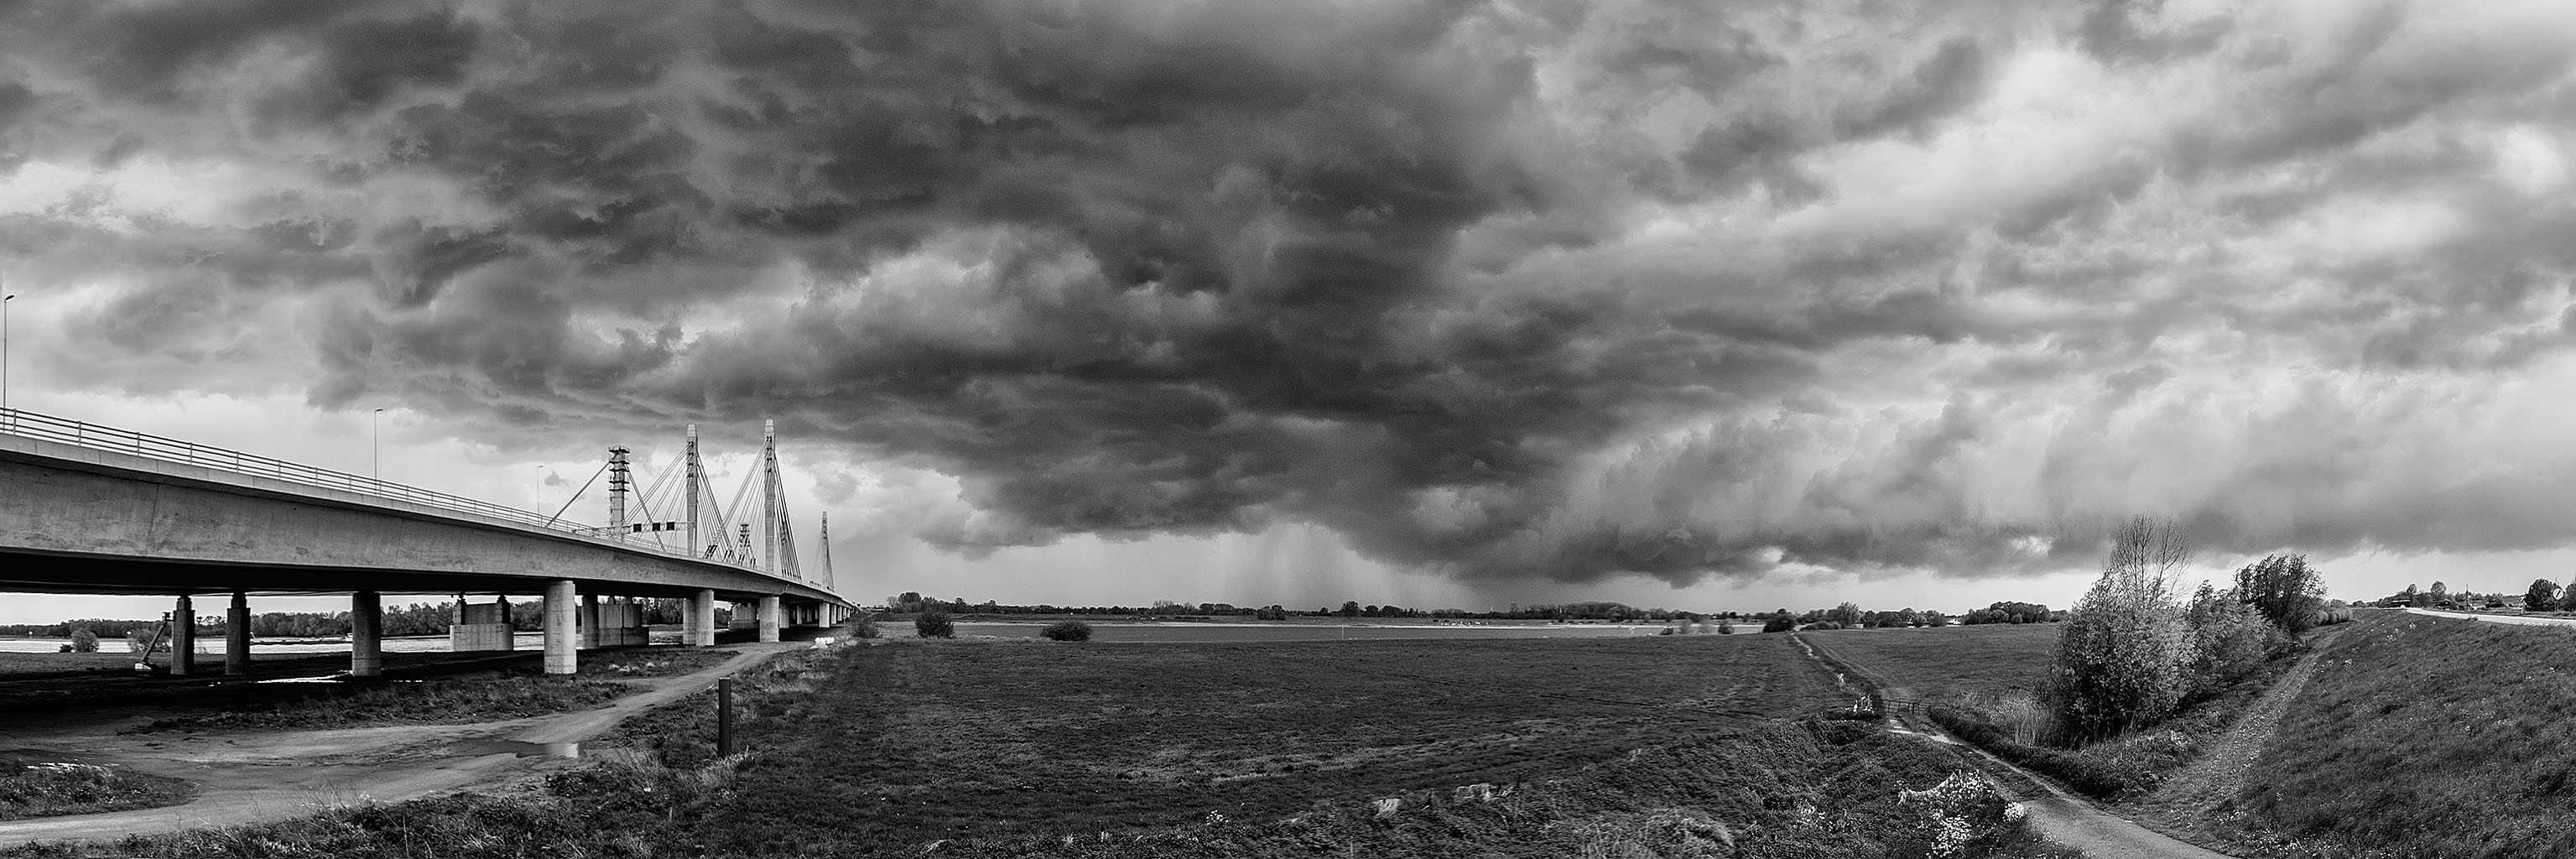 Storm 5-5-2015 black 11